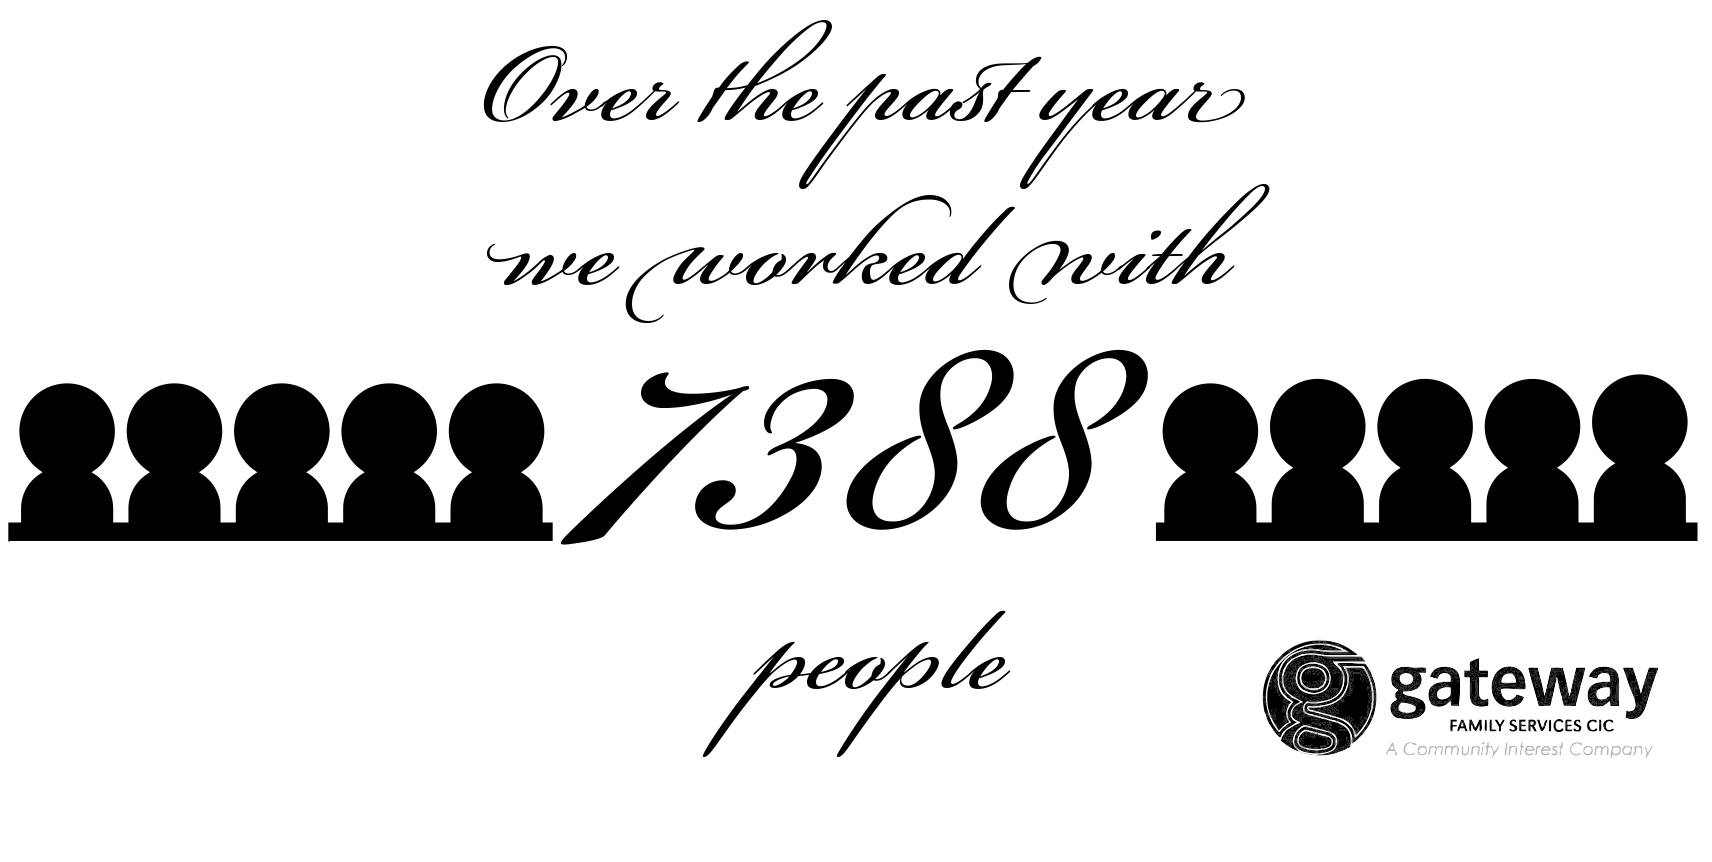 7388 people